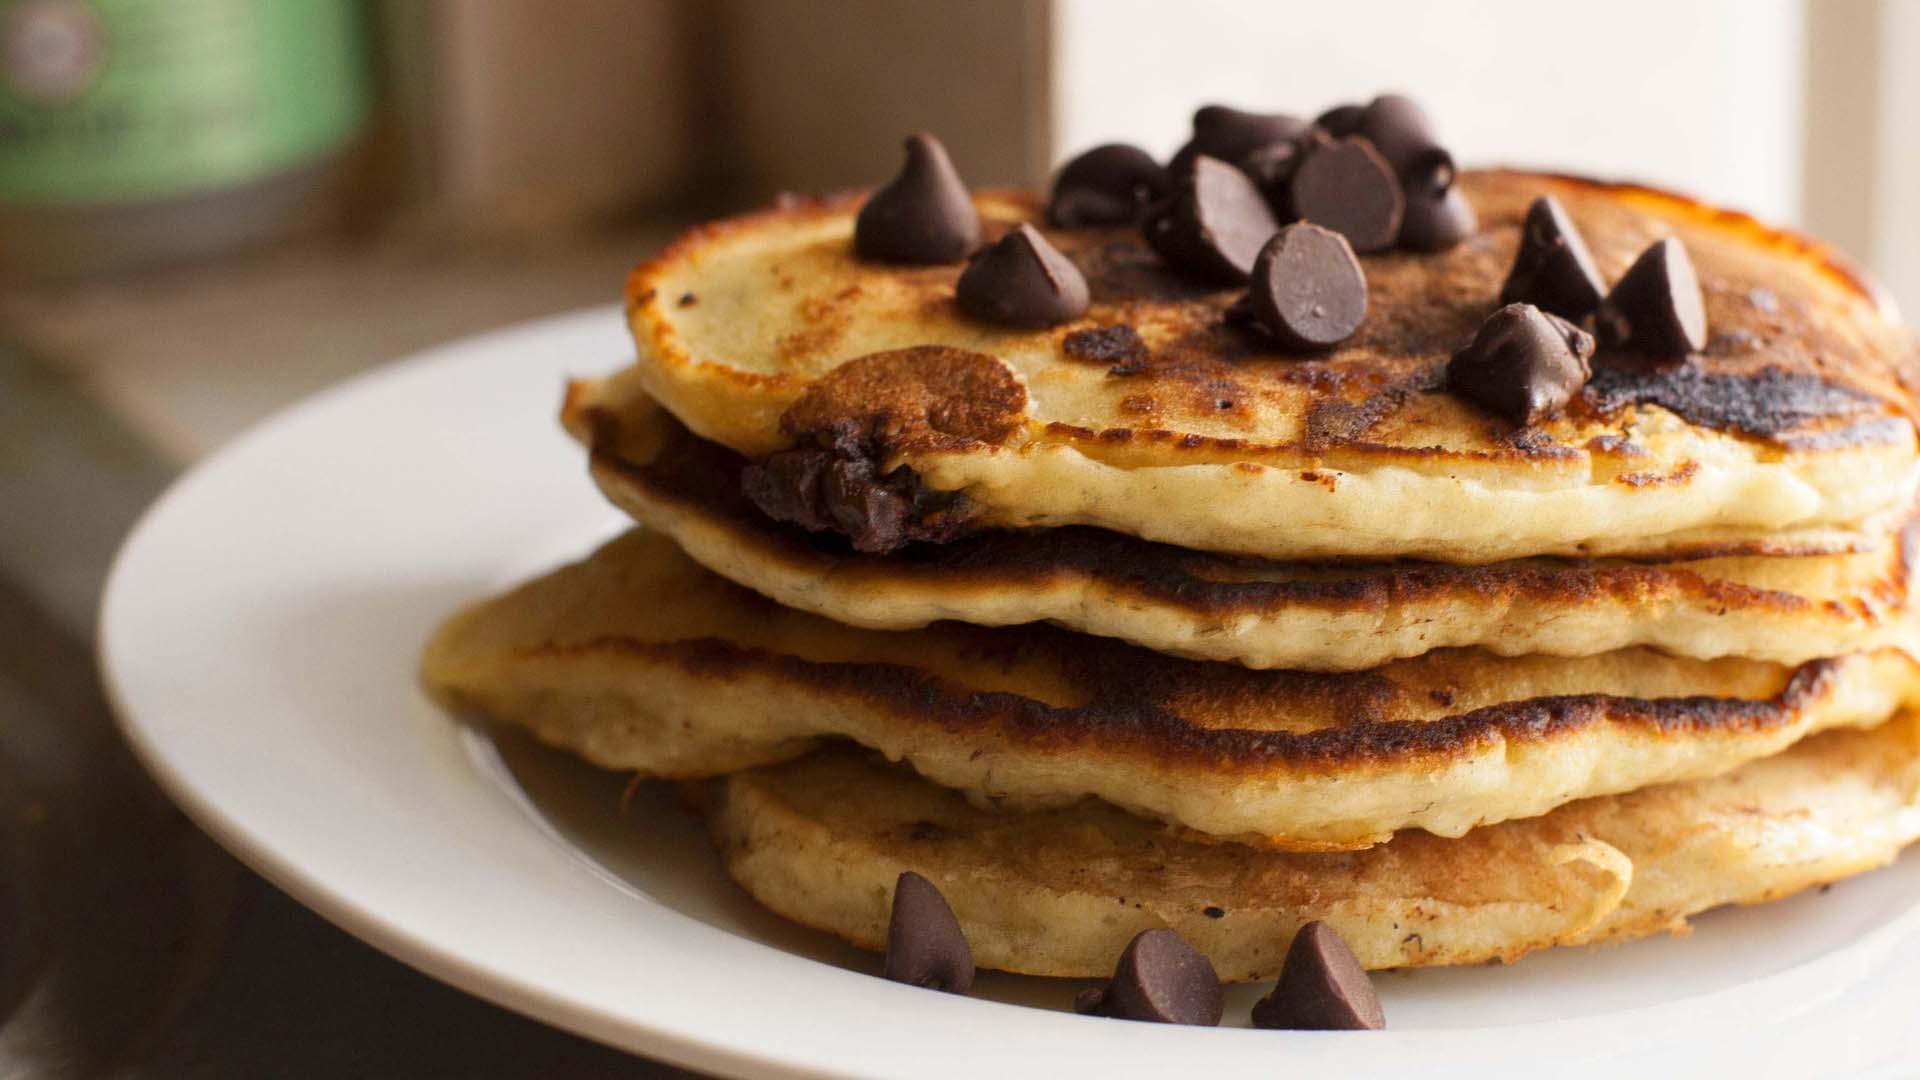 Chocolate Chip Pancakes Wallpaper 49916 1920x1080px 1920x1080